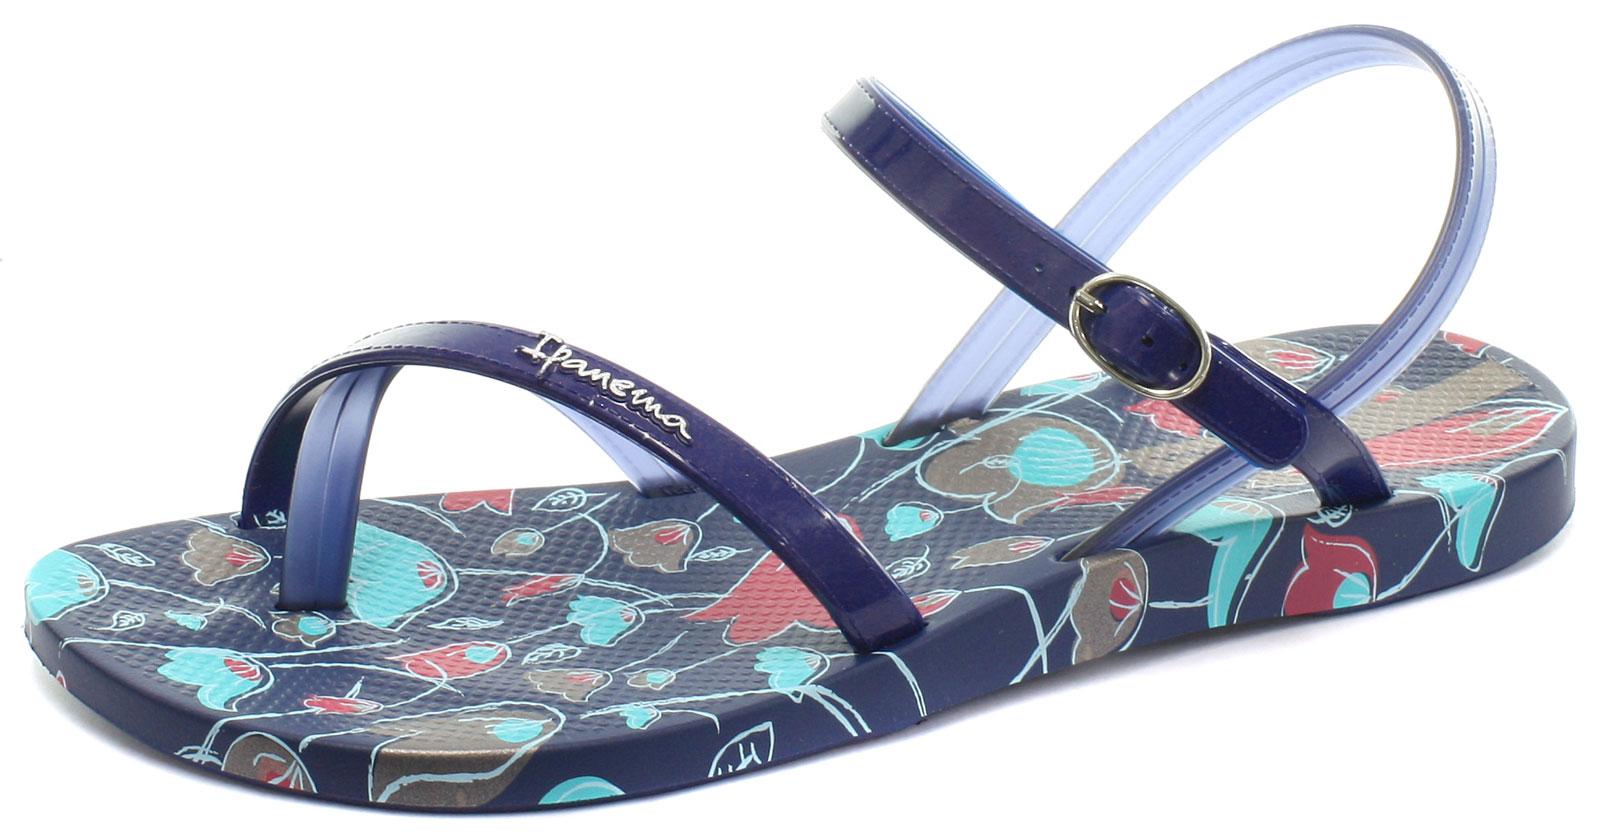 4a857cef9ec12 IPANEMA BRASIL DIAMOND IV Navy Womens Beach Sandals Size UK 5 (EU 38 ...